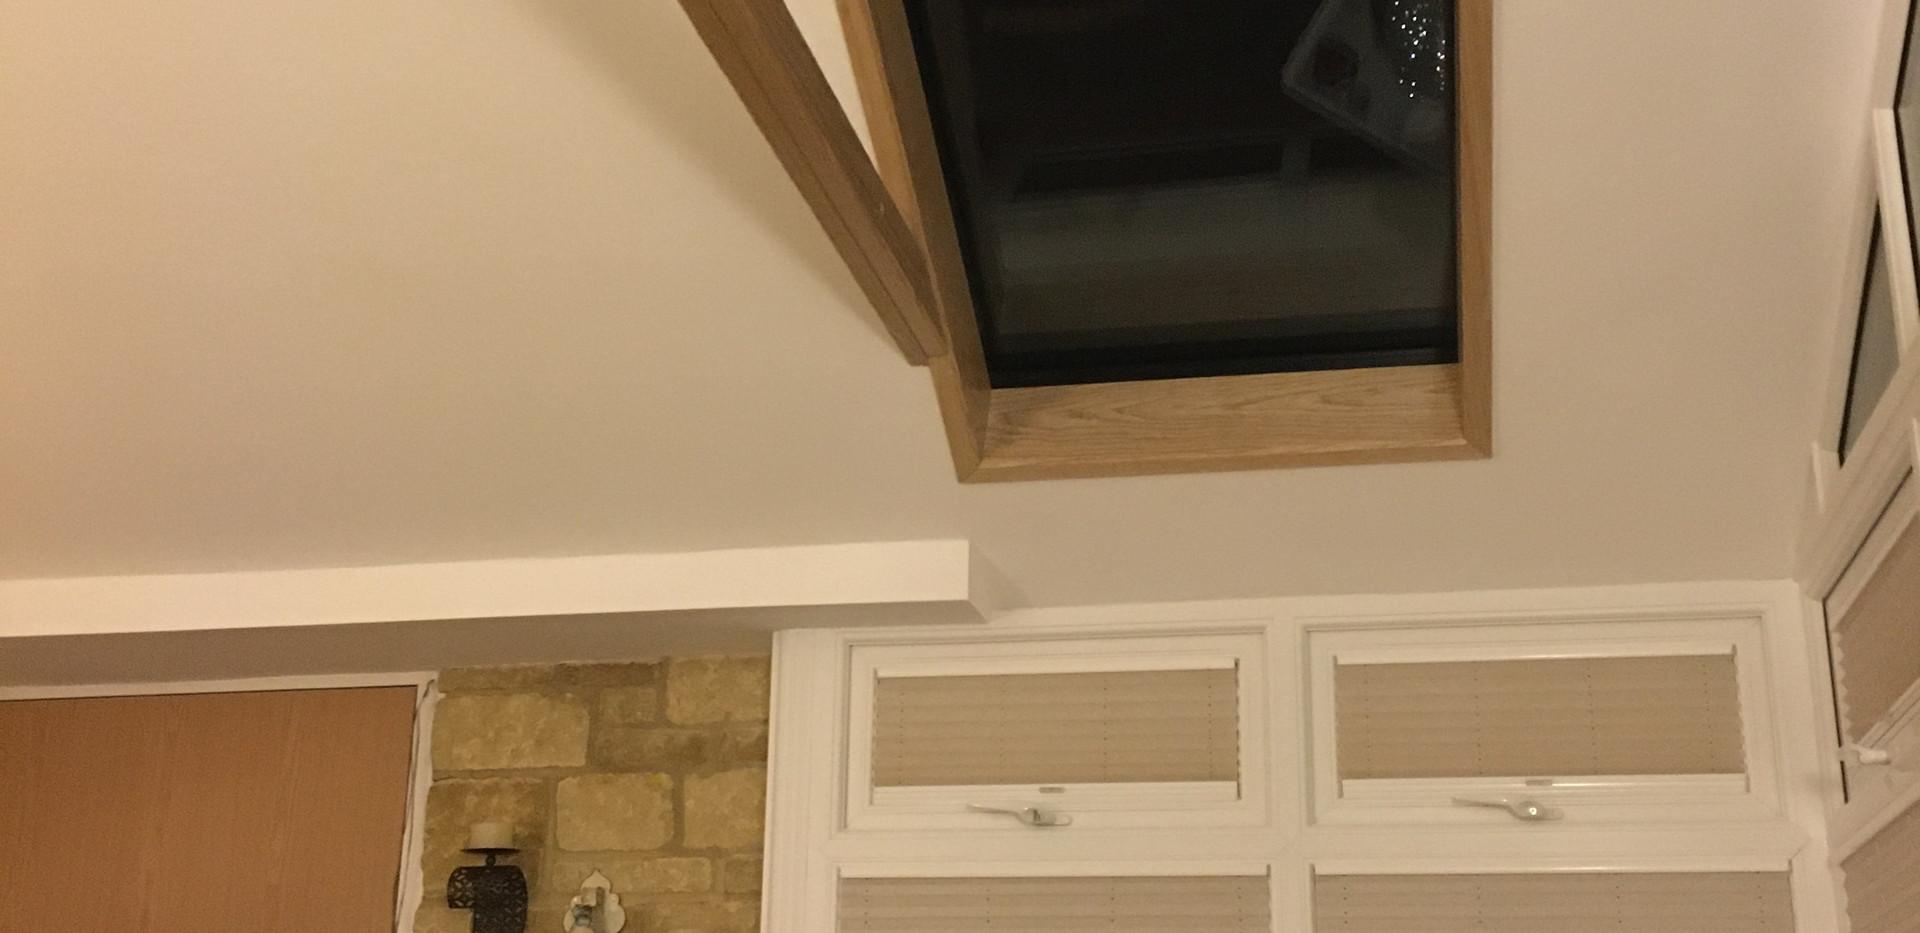 Finished ceiling showing Hybrid skylight